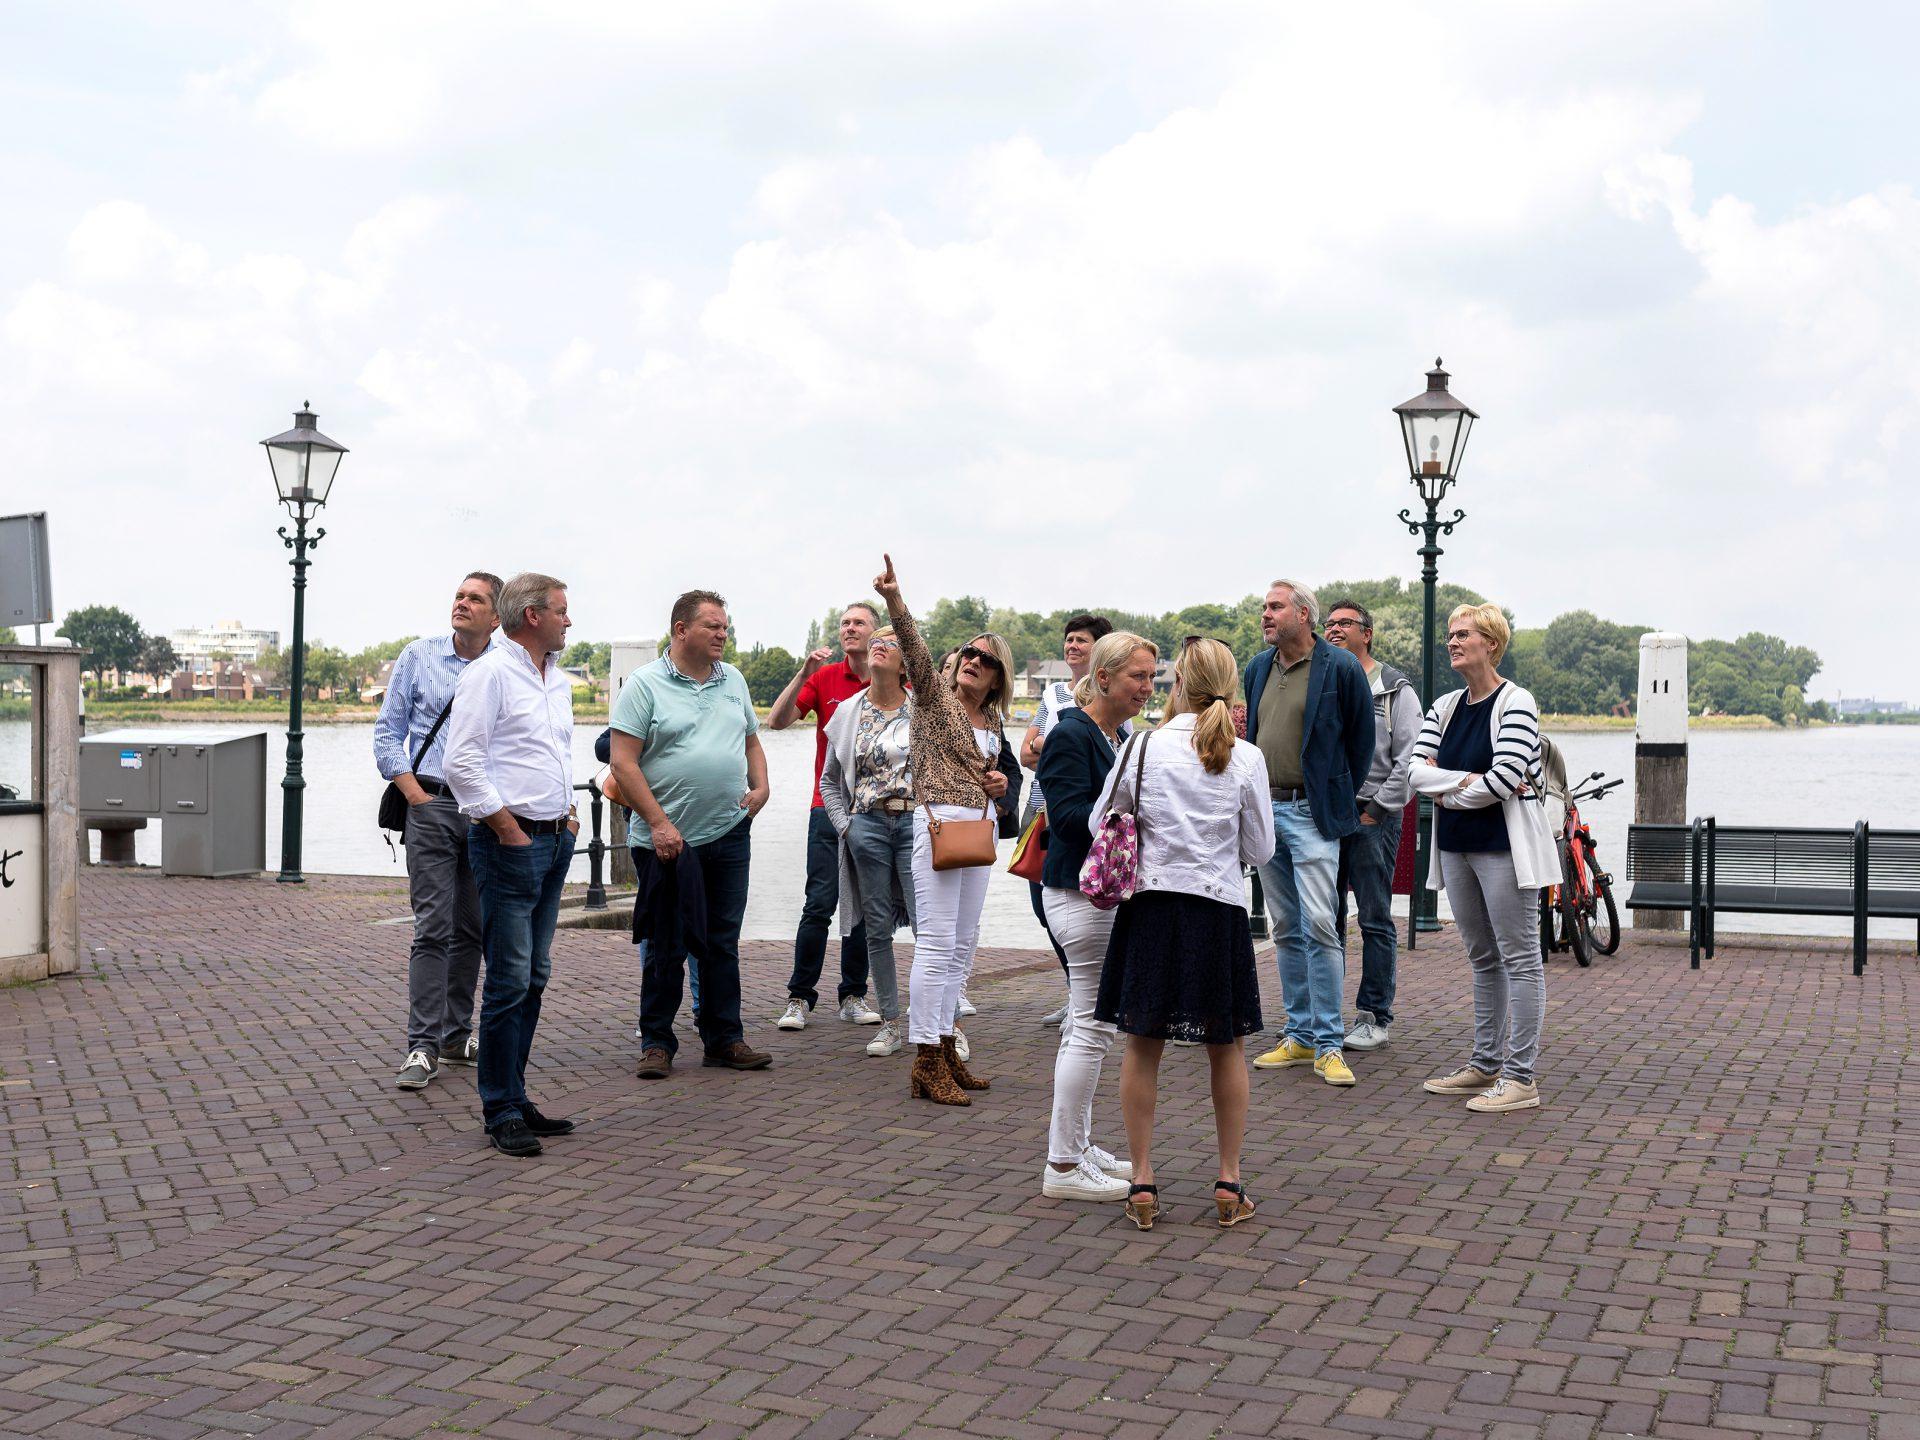 Stadswandeling - Dagtochten Dordrecht